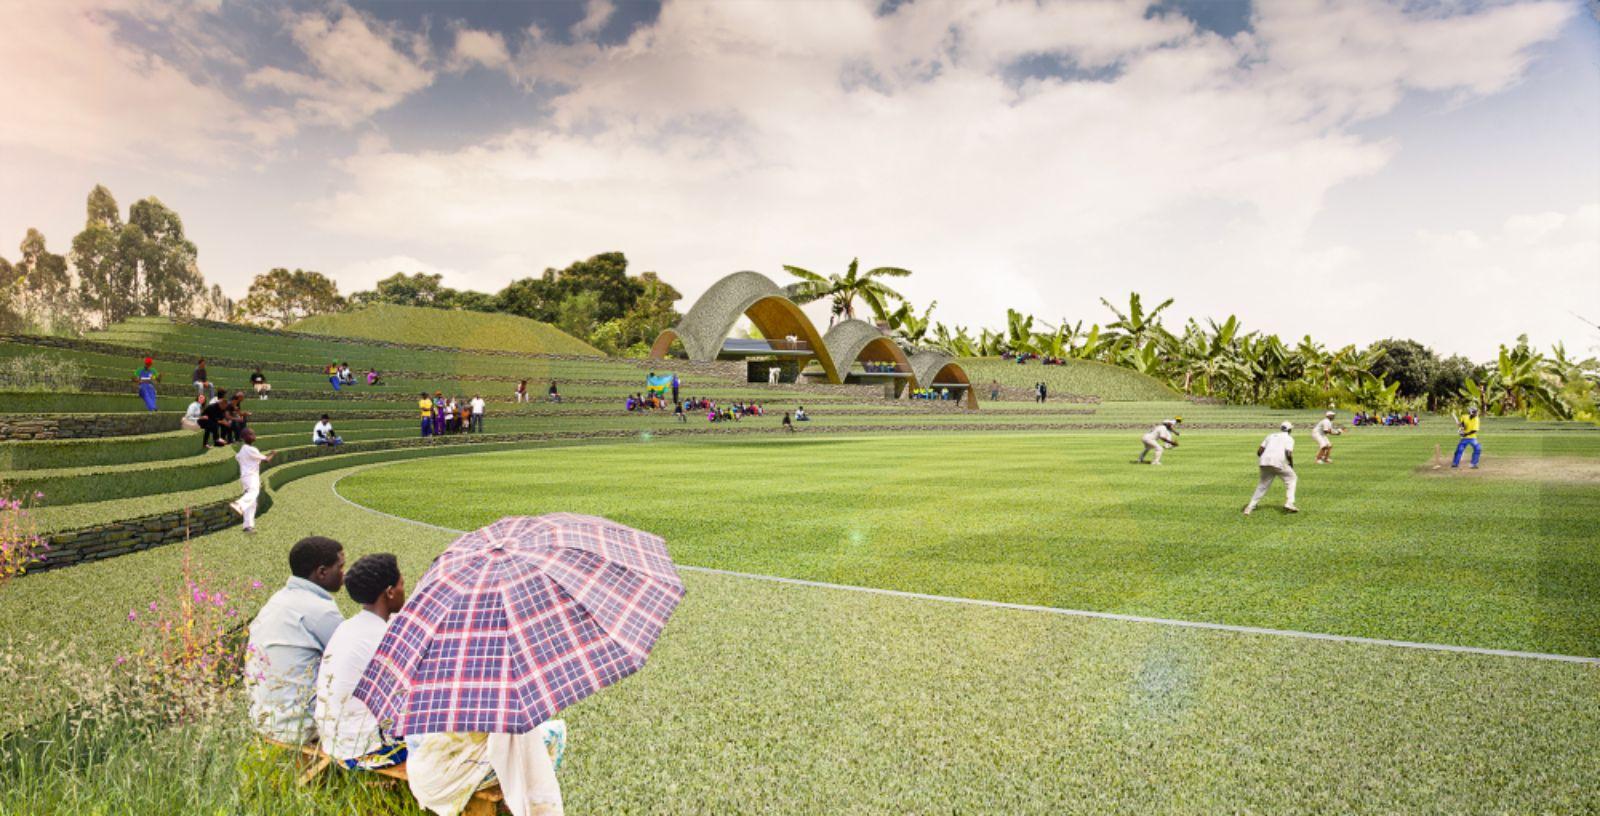 The Rwanda Cricket Stadium